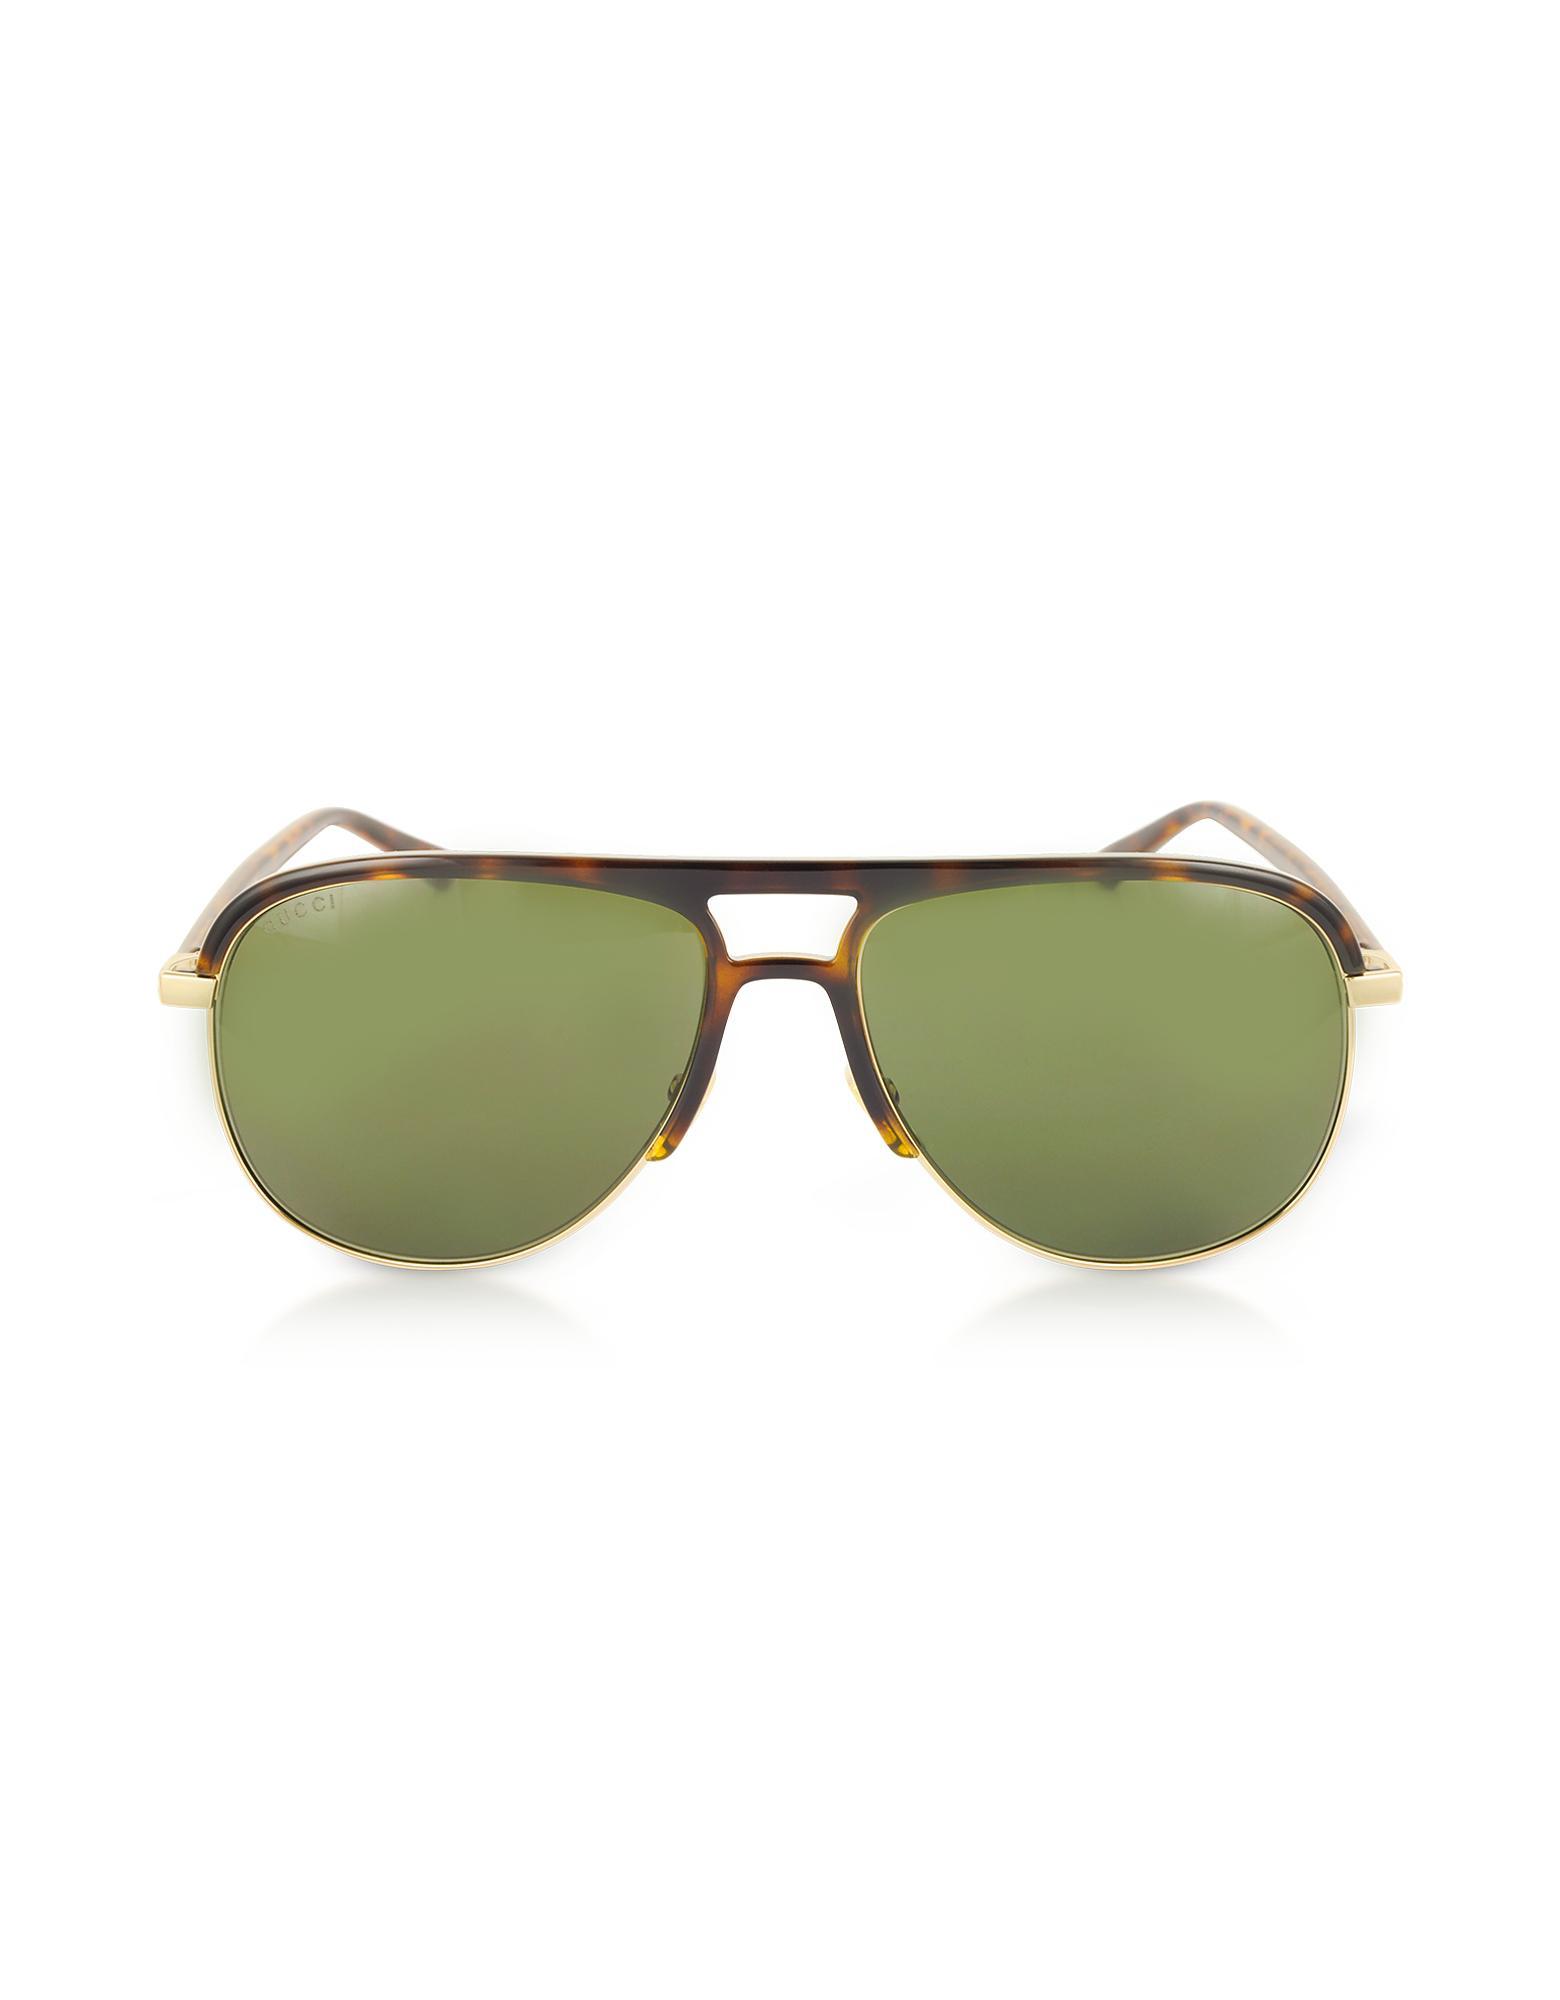 af98ec4d1a0 Lyst - Gucci GG0292S Metal And Acetate Frame Aviator Sunglasses in ...